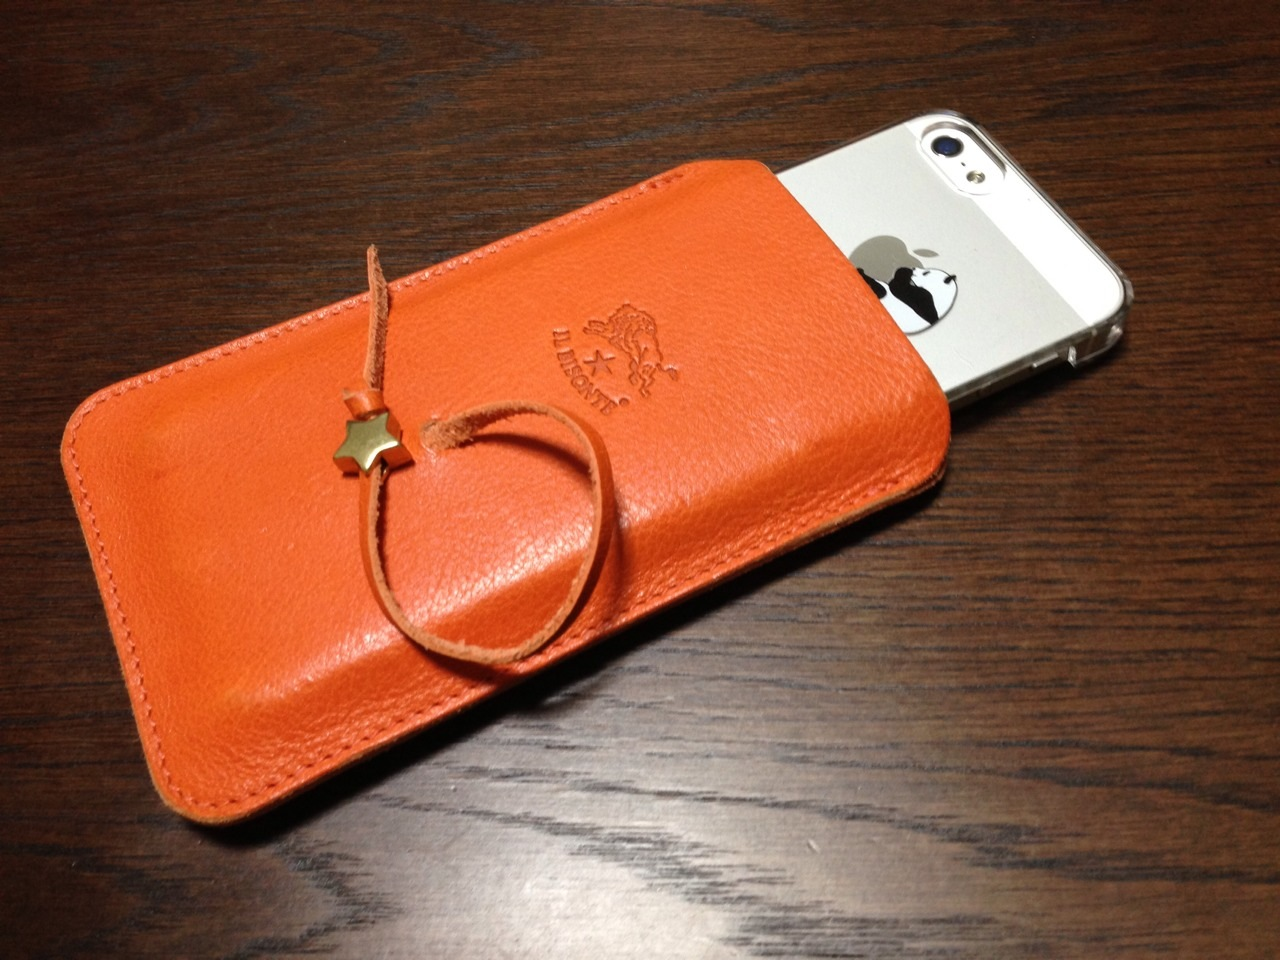 309c7cd3167a 楽天市場】【 IL BISONTE イルビゾンテ 】 【 iphoneケース 携帯電話 ...